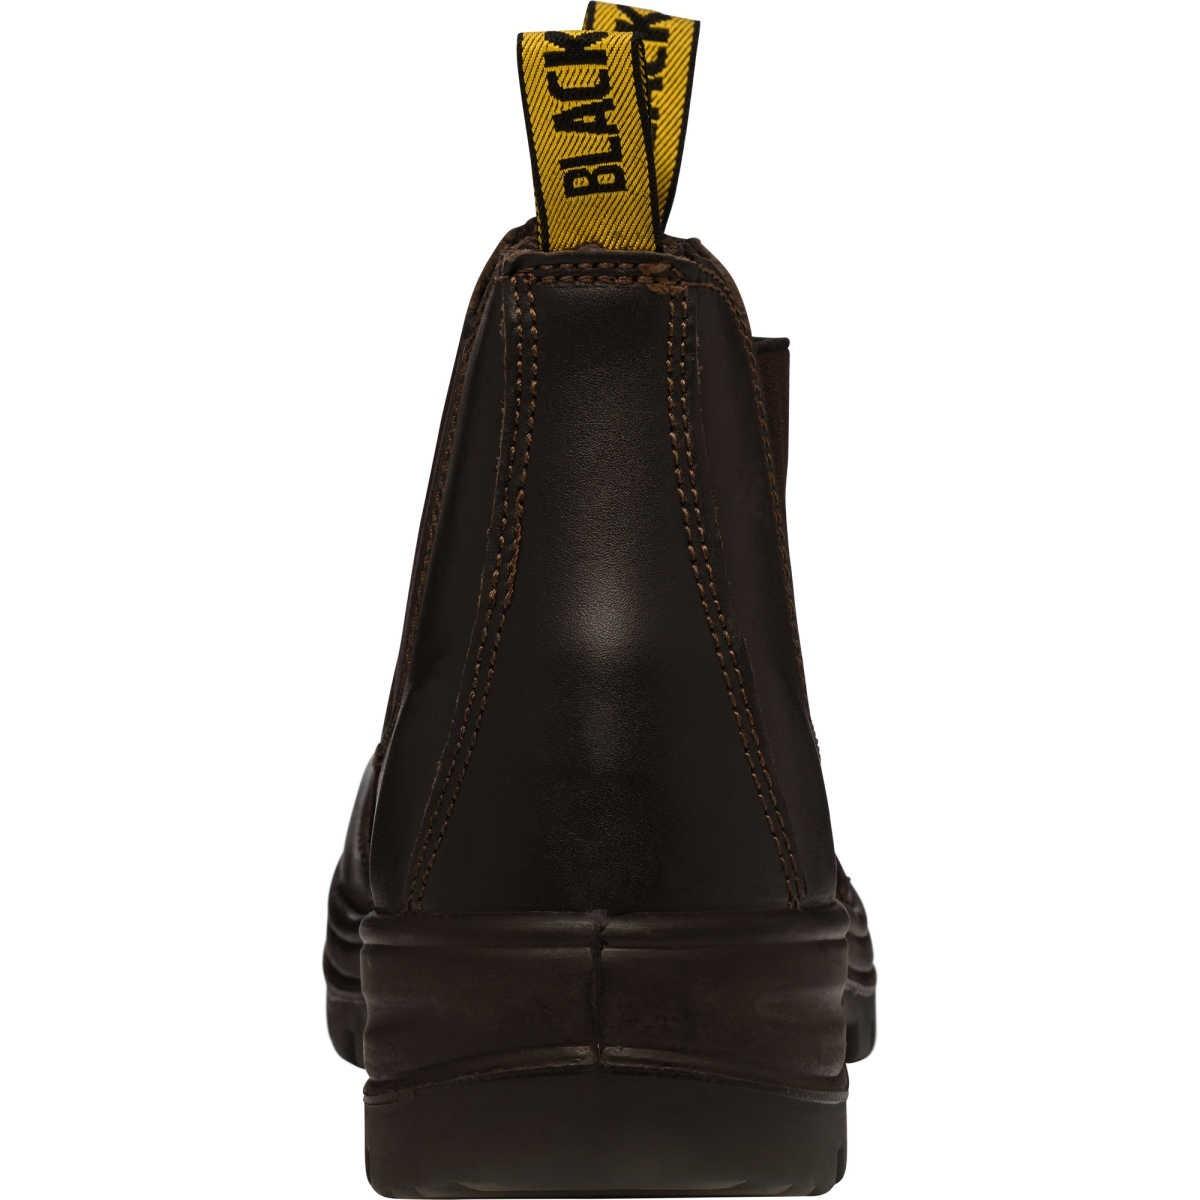 de8f64da5cc Blacksmith Celt Steel Cap Work Boots - Black - Size 7